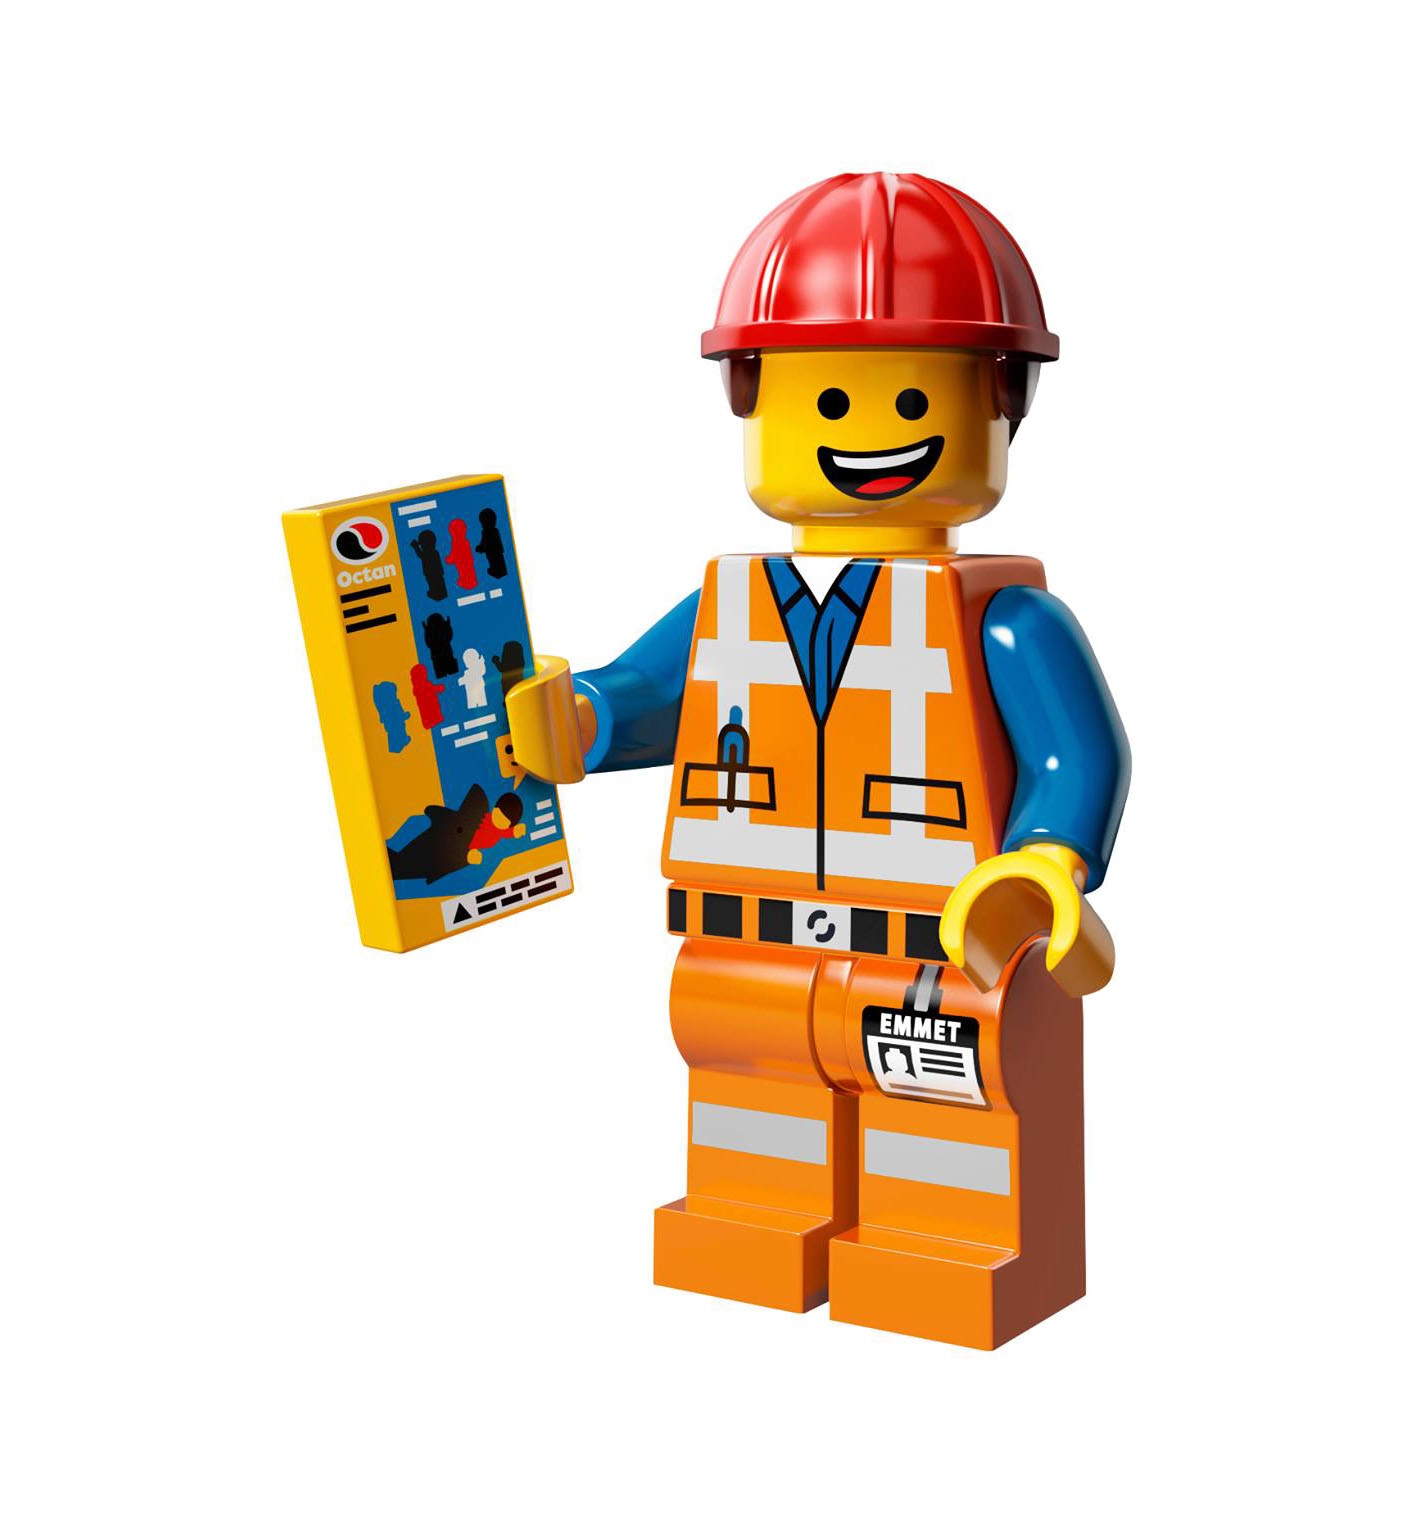 Lego Movie Toys : Image cmf emmet g brickipedia fandom powered by wikia